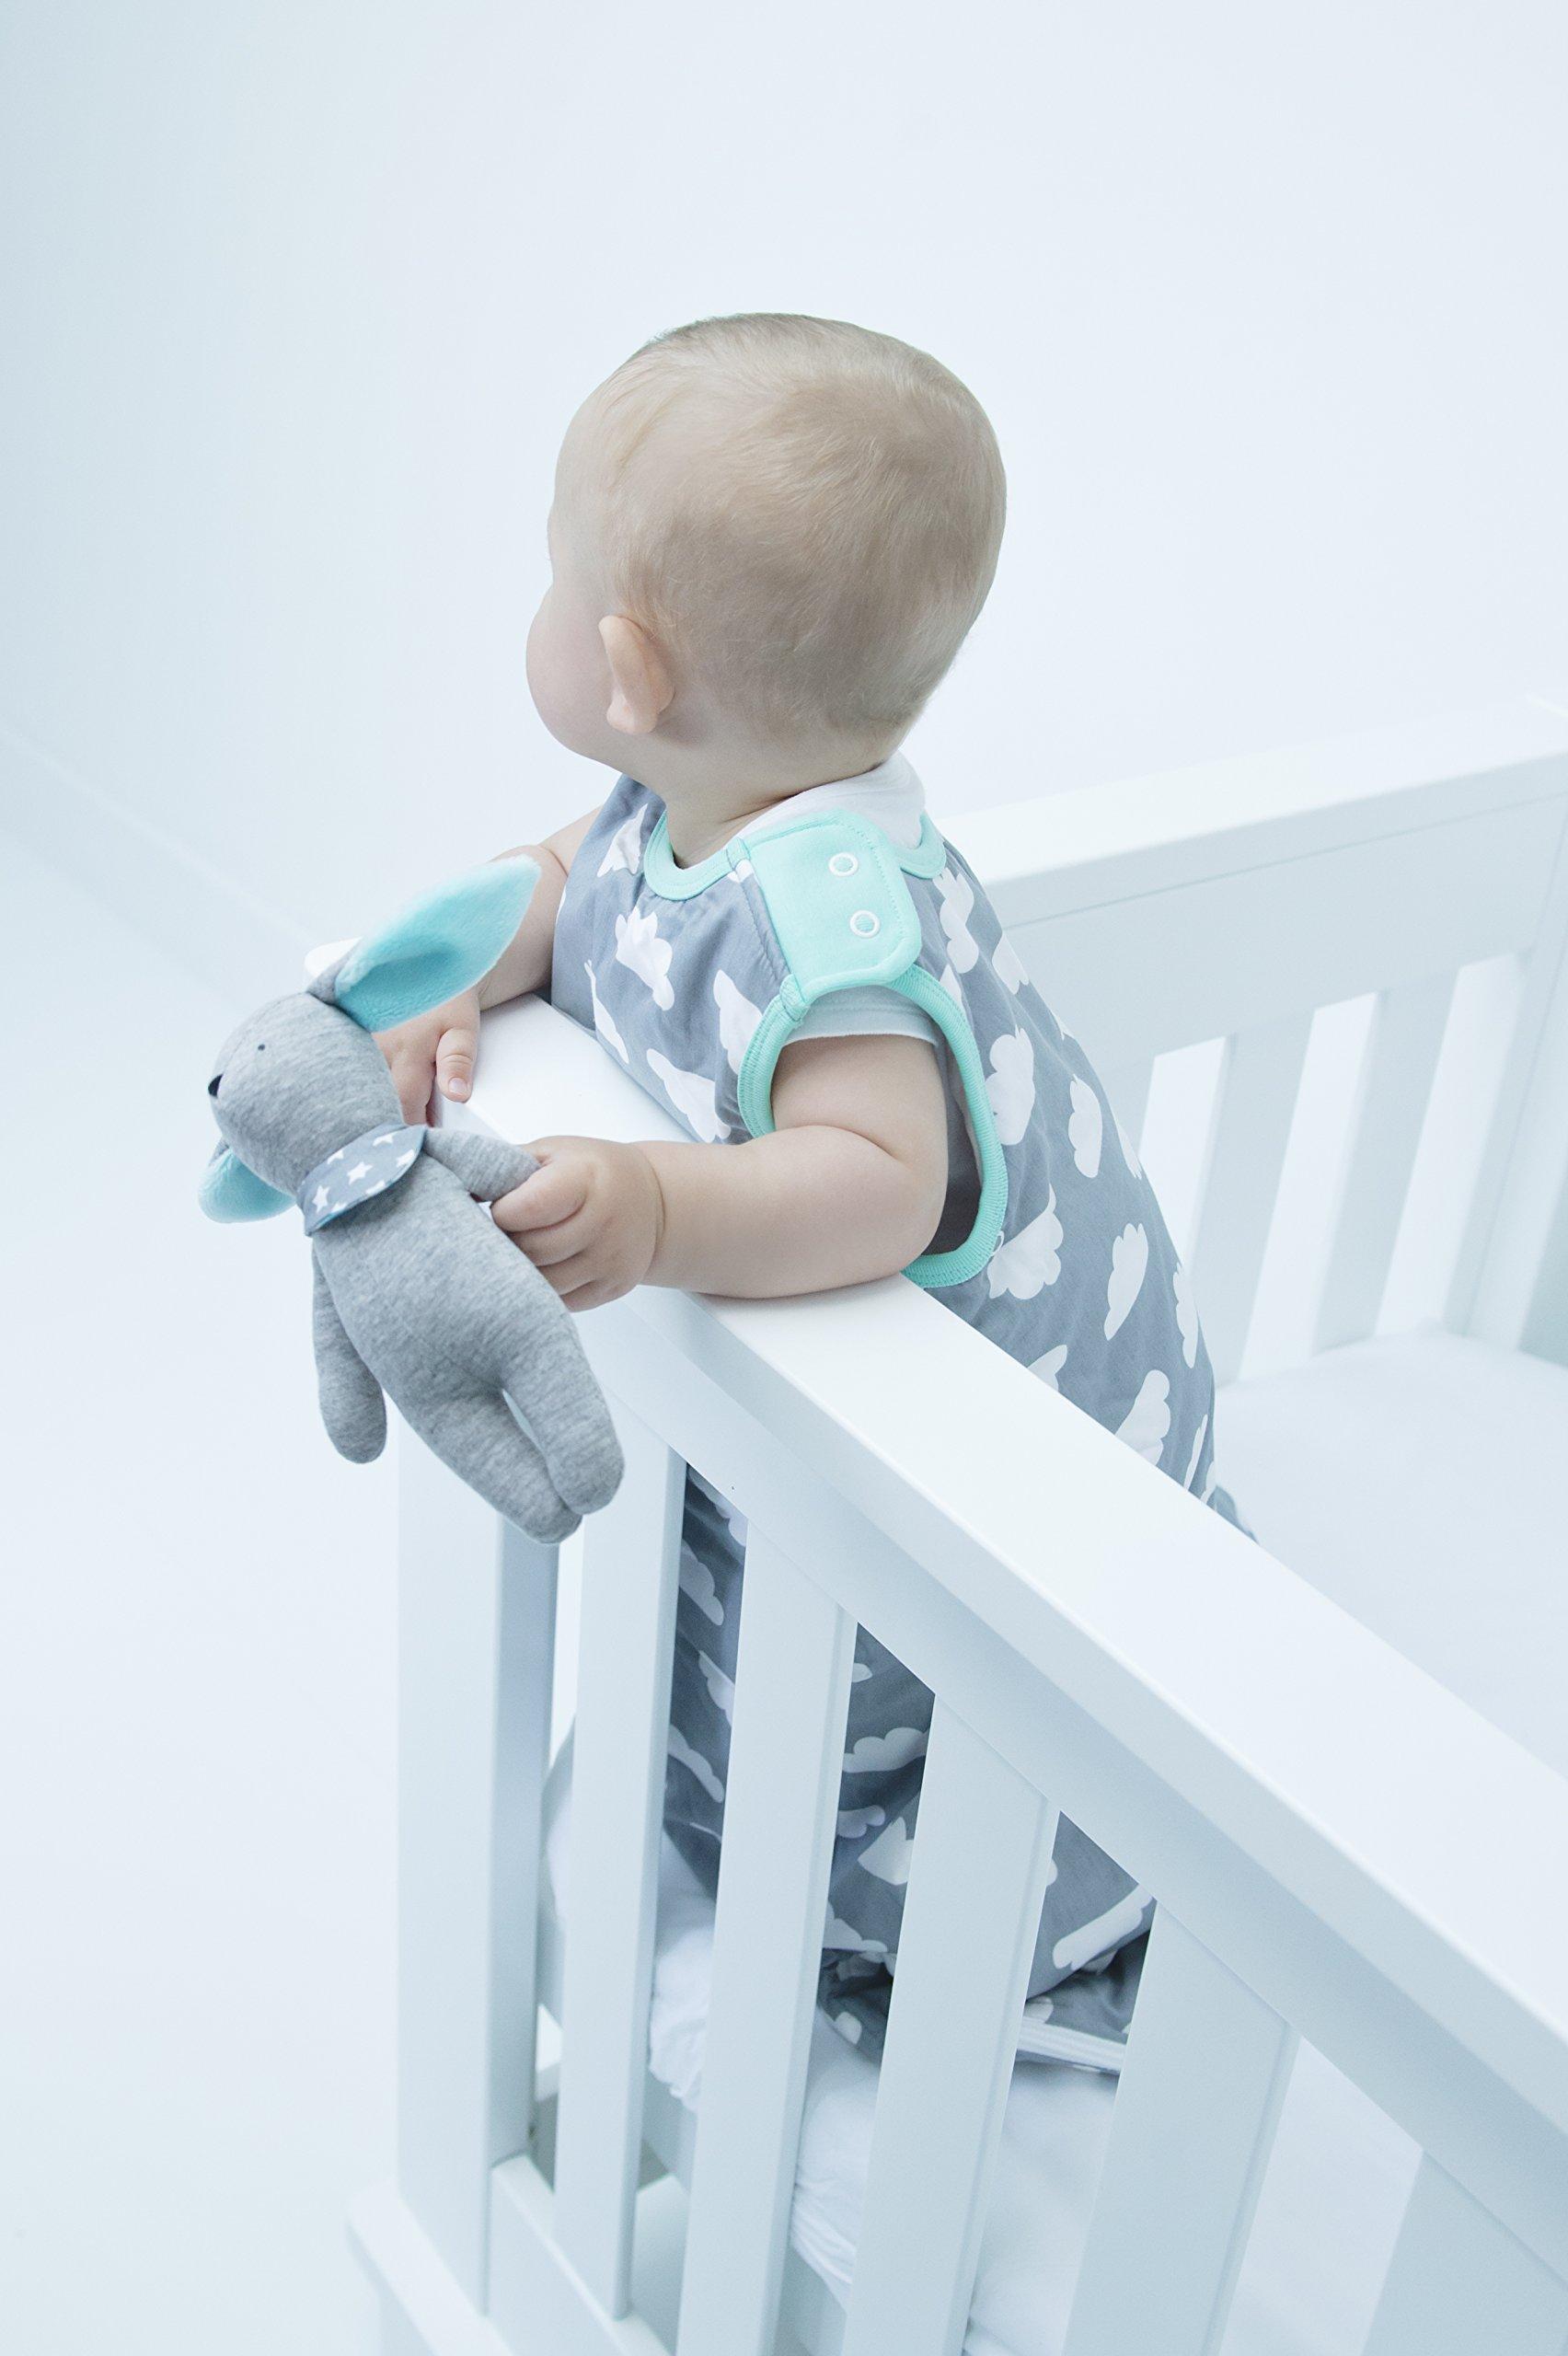 71JbwQe0oRL - Saco de dormir para bebés de 6 a 18 meses, de la marca Babasac. Diseño de nubes, color gris y turquesa